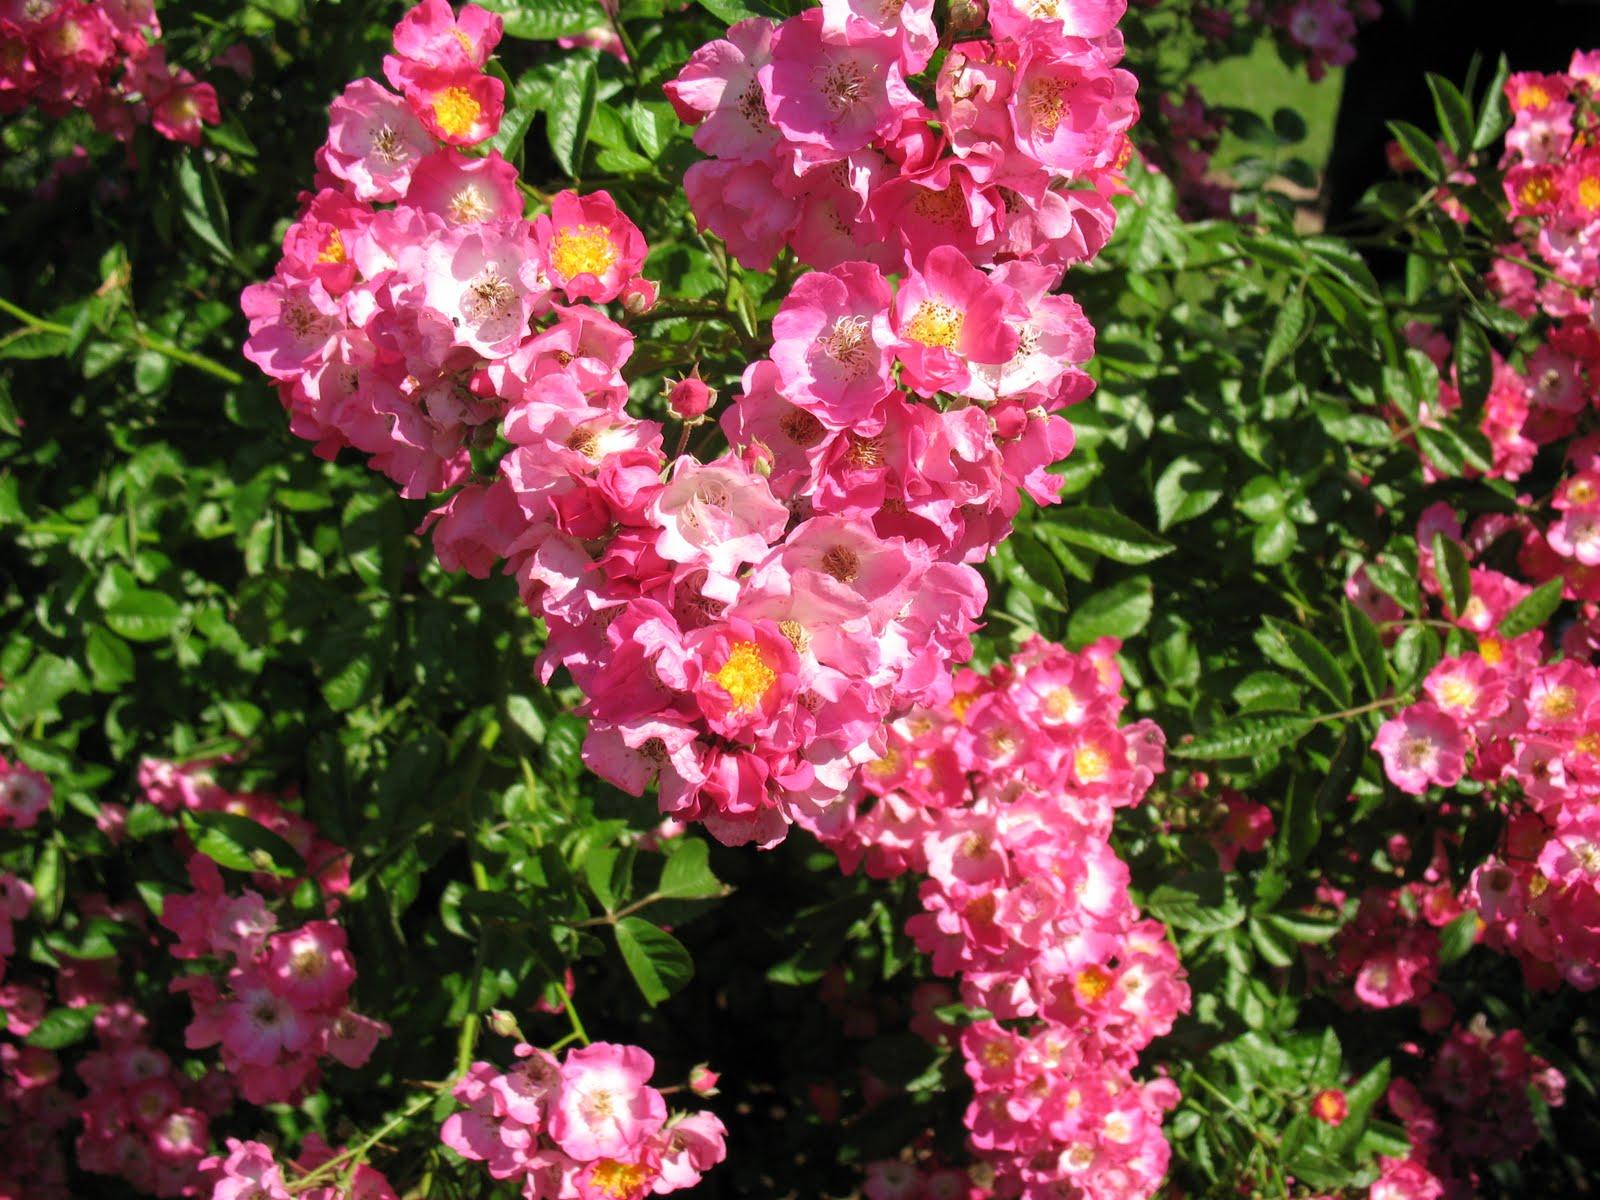 Roses du jardin ch neland rosier maria lisa - Comment tailler des rosiers ...